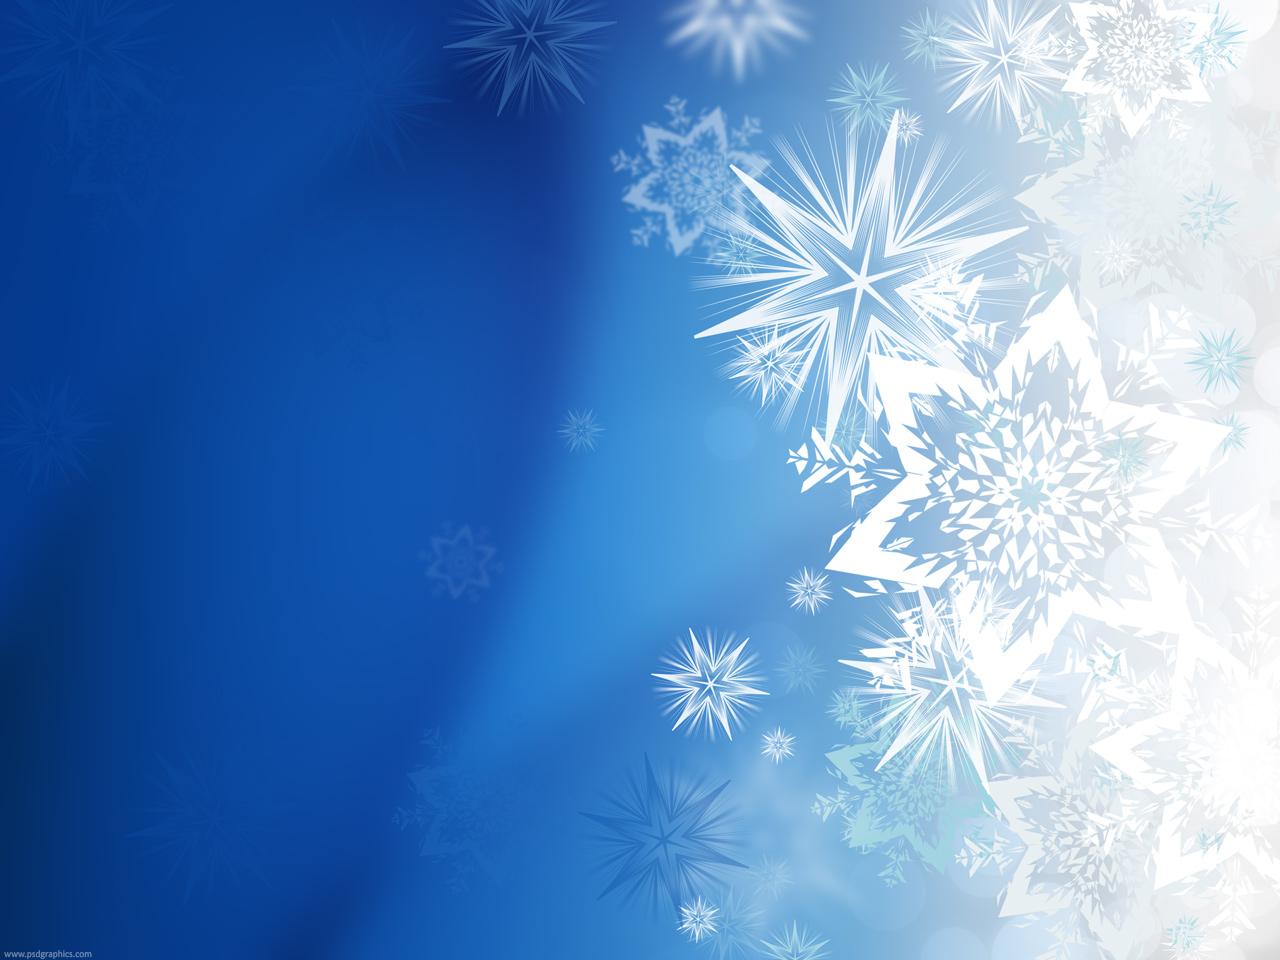 Magic winter snowflakes PSDGraphics 1280x960